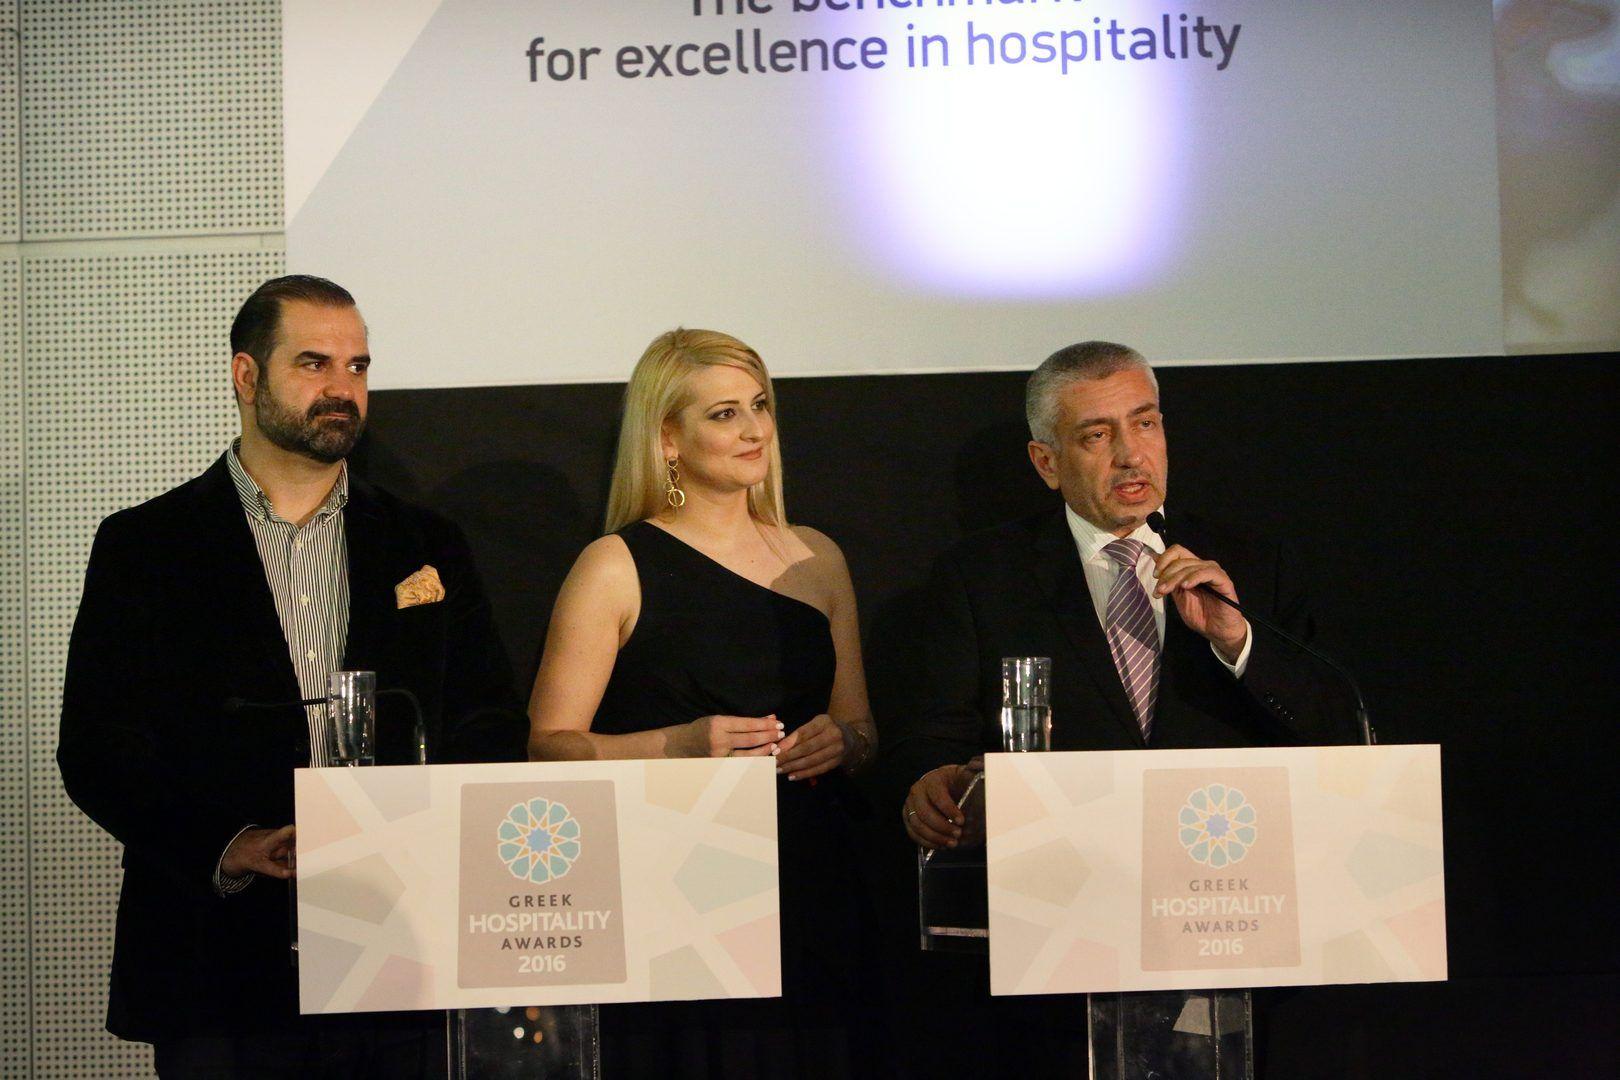 Oι παρουσιαστές της βραδιάς Σοφία – Αφροδίτη Βουλγαράκη & Χάρης Ντιγριντάκης μαζί με τον Κωνσταντίνο Ουζούνη